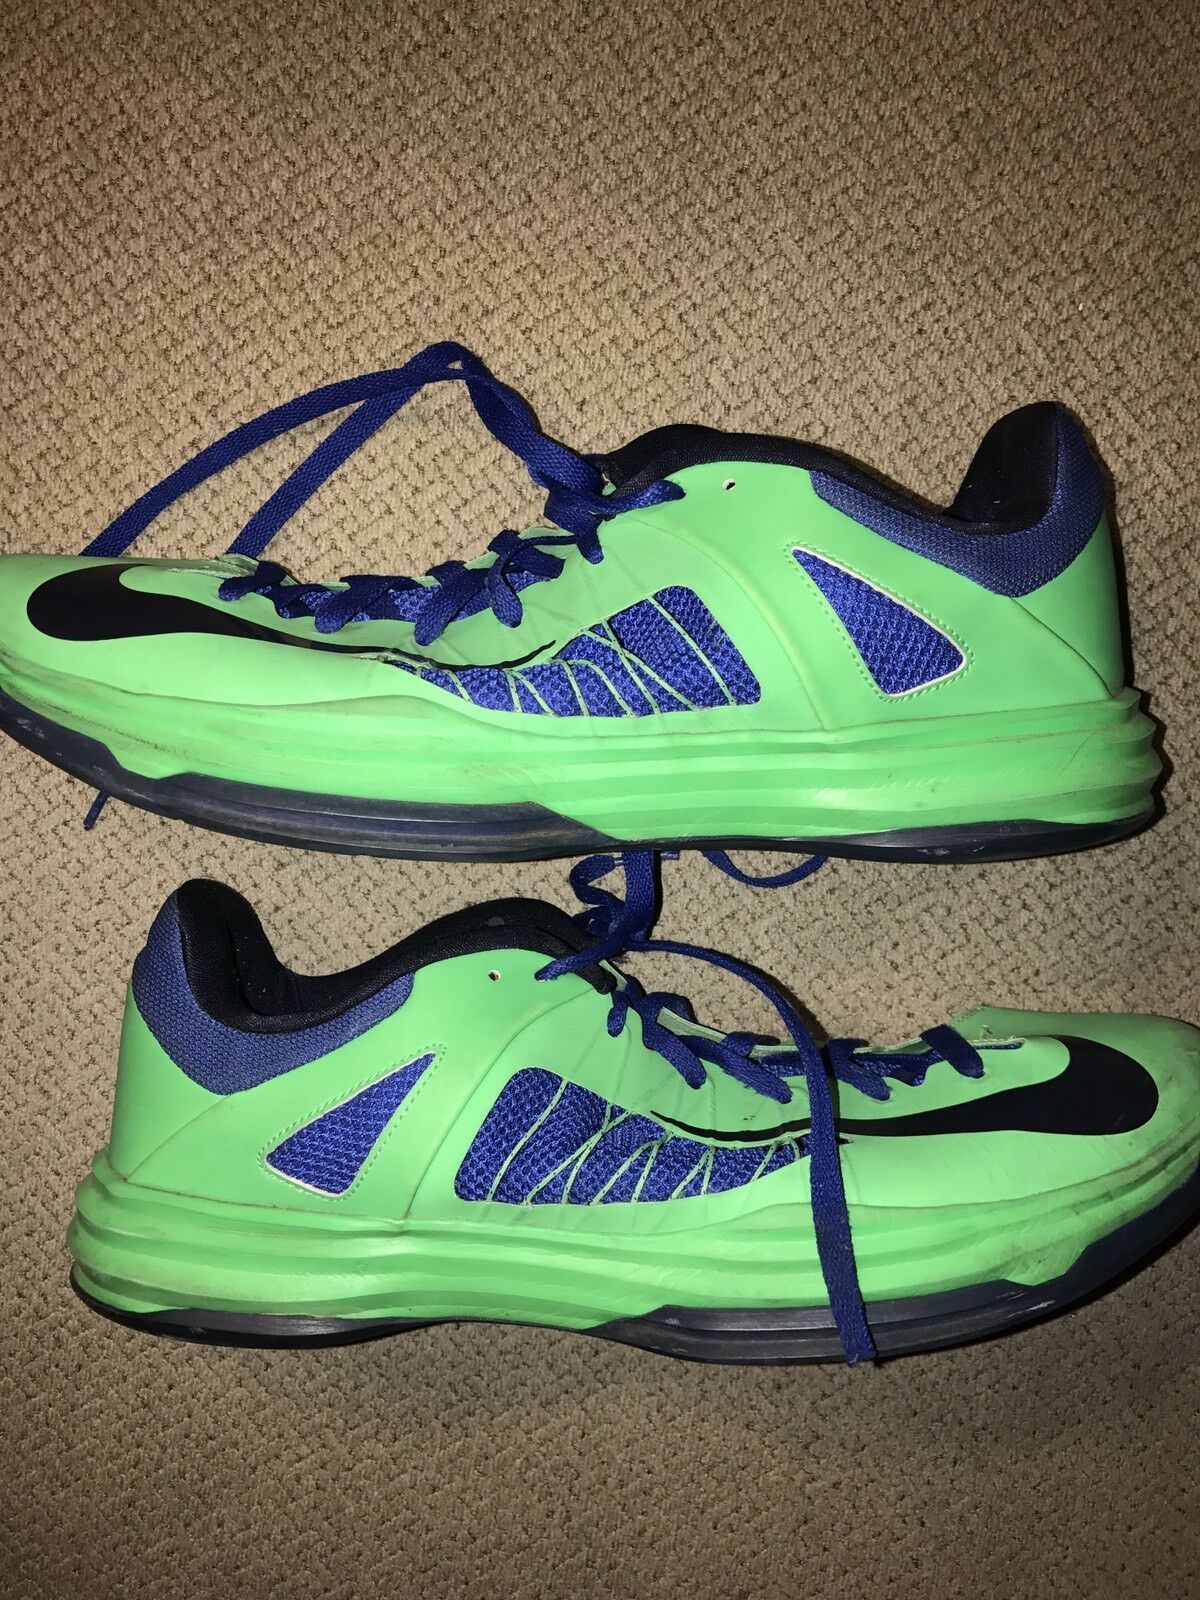 6efd0f8914774 Men s Men s Men s NIKE Hyperdunk Low Top Basketball Shoes 554671-302 size  15 29b476